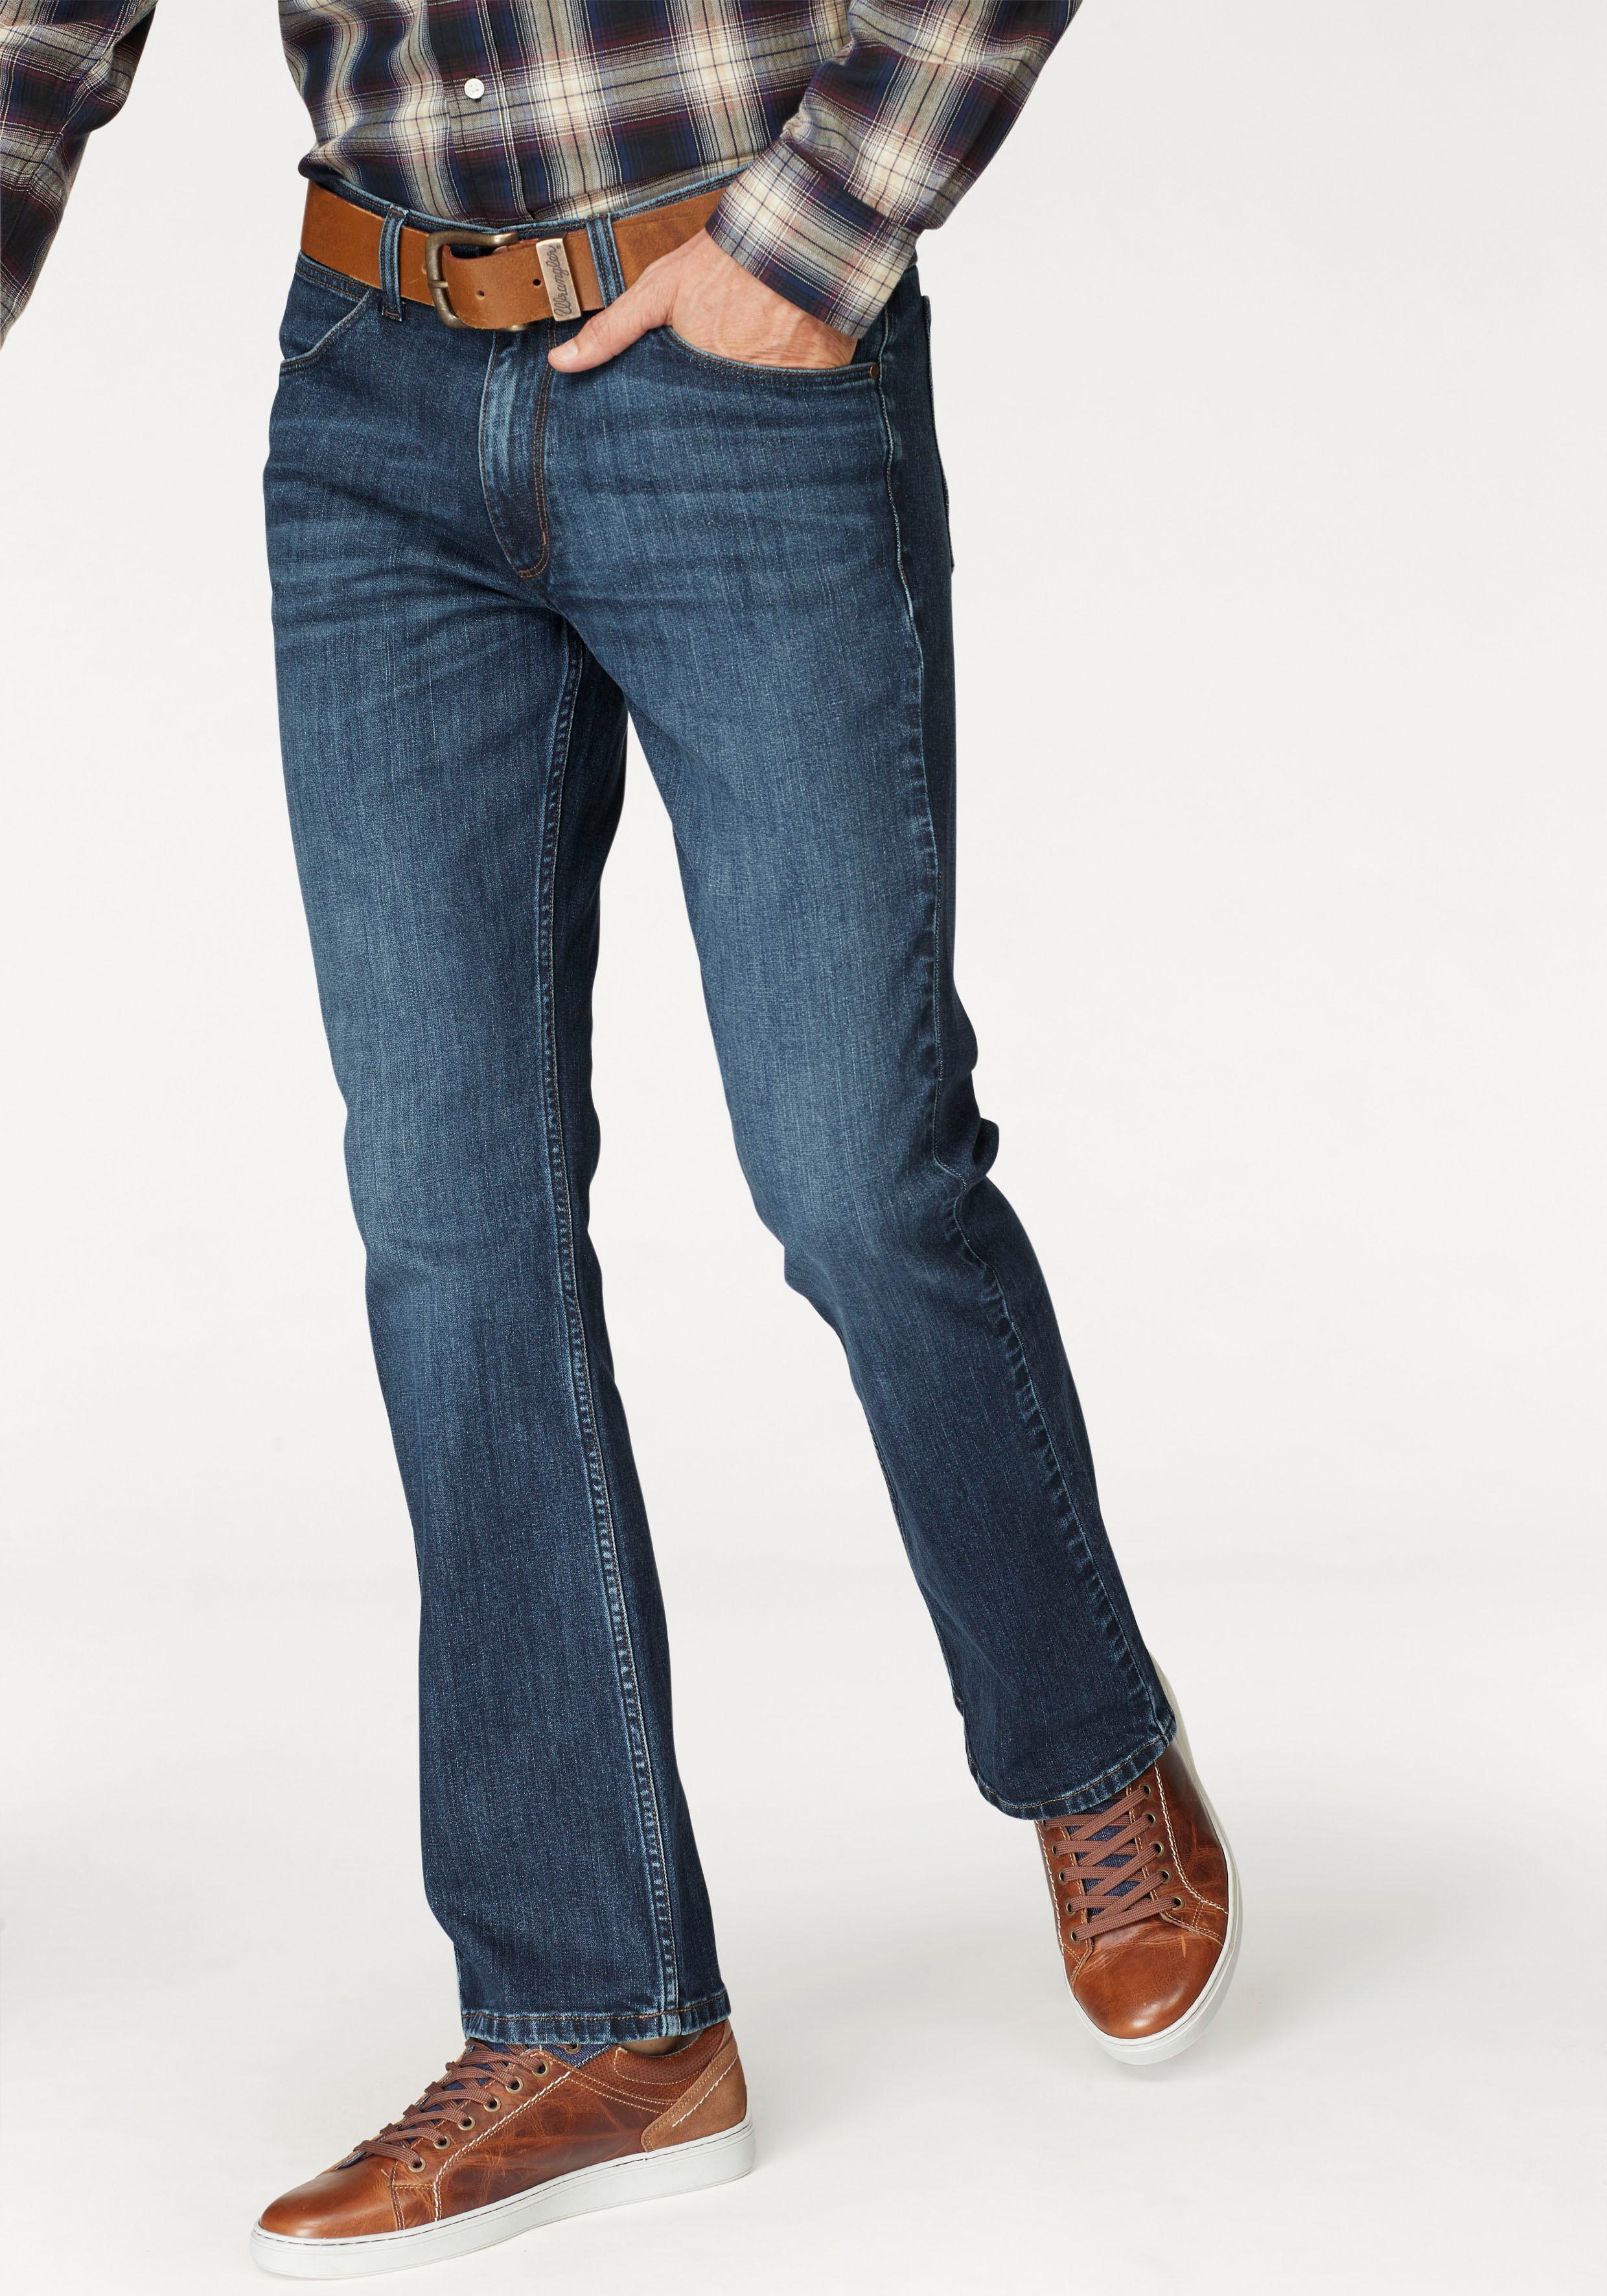 Wrangler Bootcut-Jeans »Jacksville« | Bekleidung > Jeans > Bootcut Jeans | Blau | Wrangler